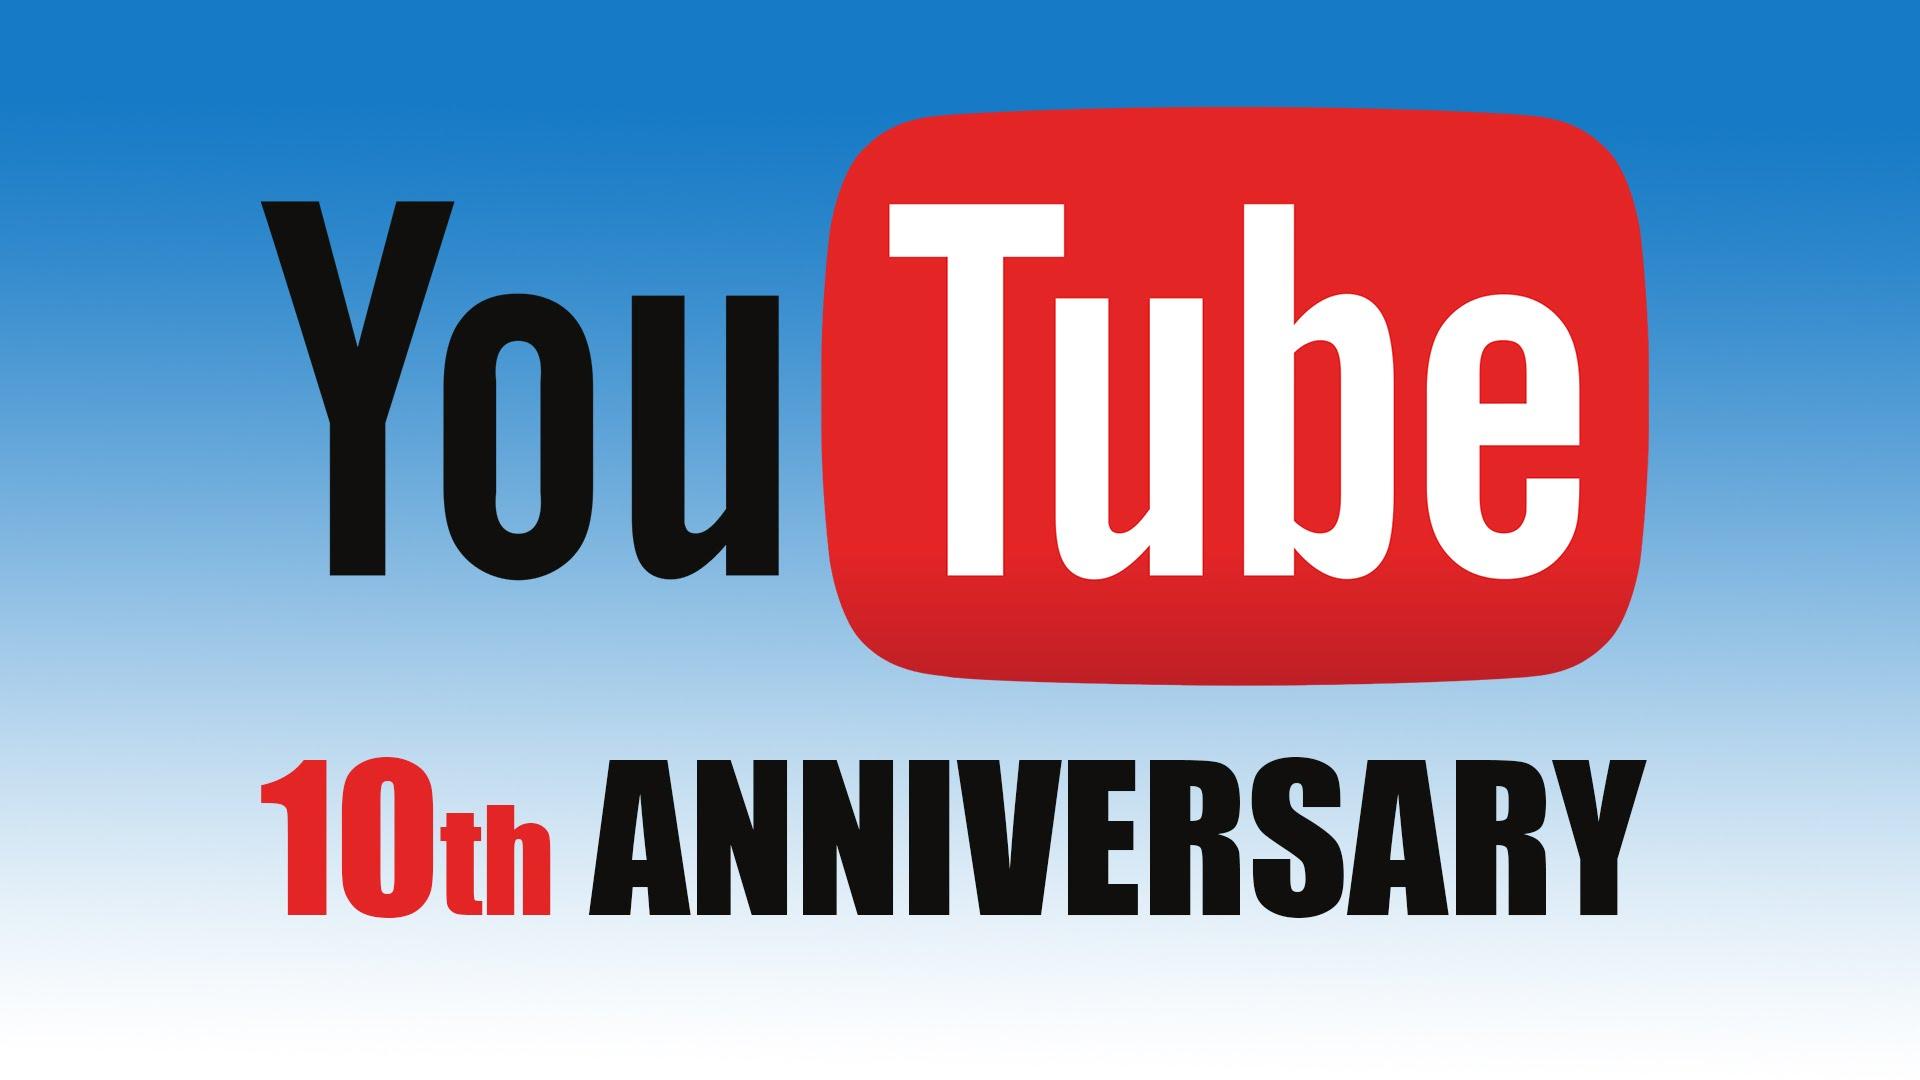 YouTube 10th Anniversary Supercut by Zapatou